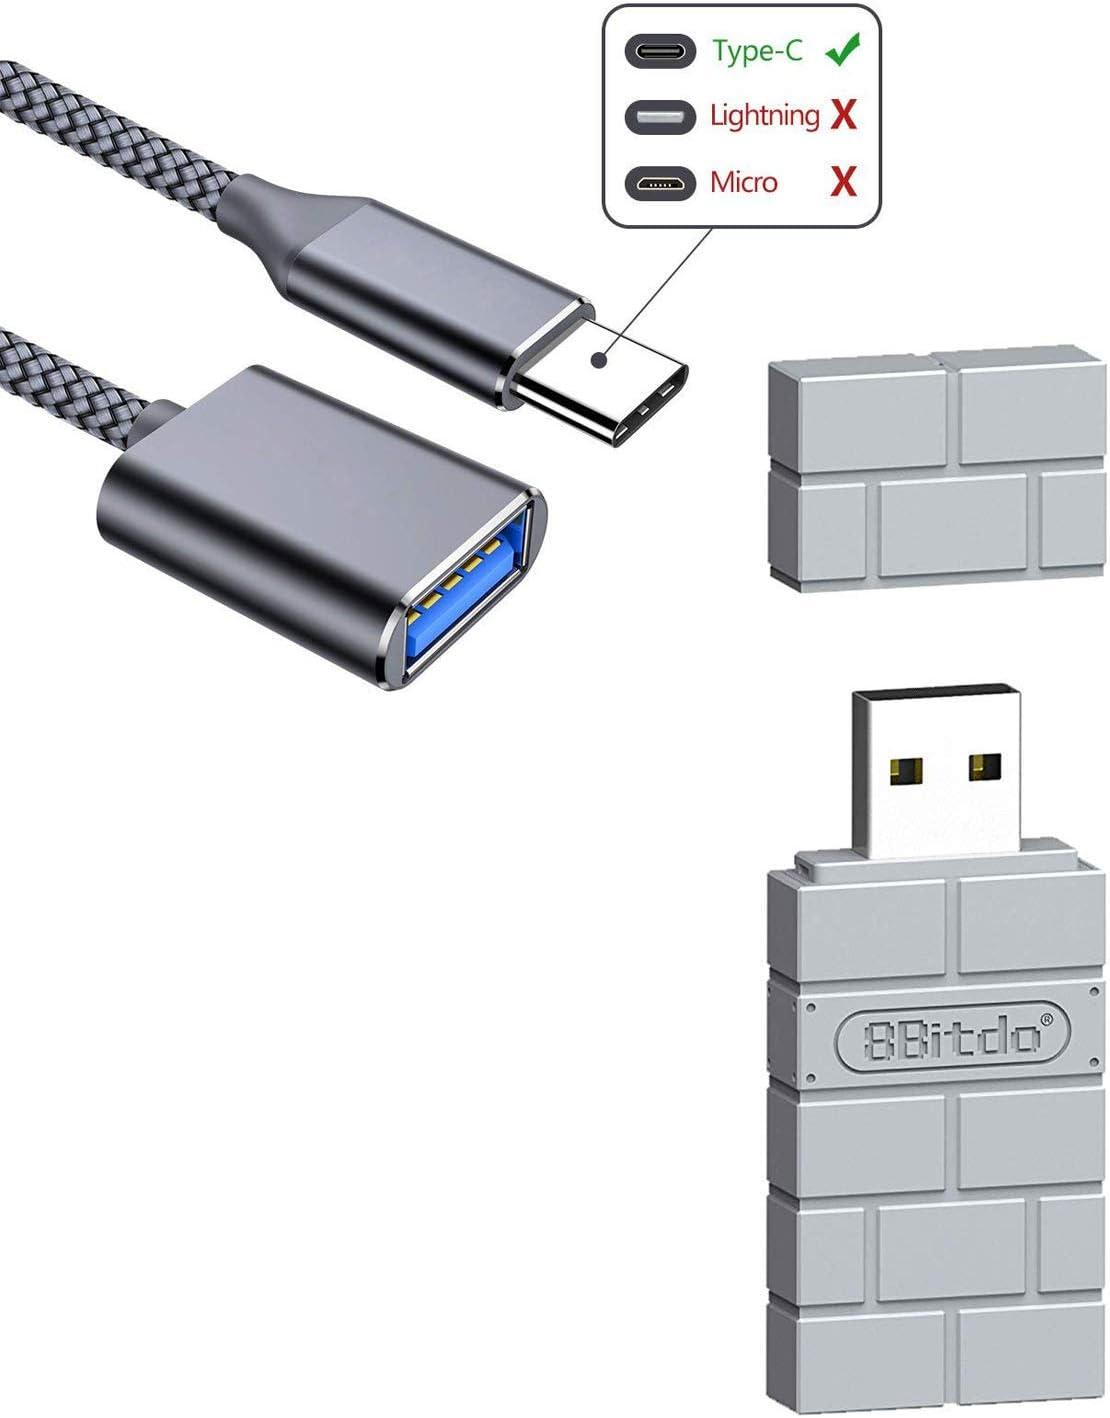 LEGADO 8Bitdo Adaptador inalámbrico gris USB para PS Classic Edition, Nintendo Switch, Mac, Windows, Raspberry Pi, Switch (Android) con un cable OTG: Amazon.es: Electrónica